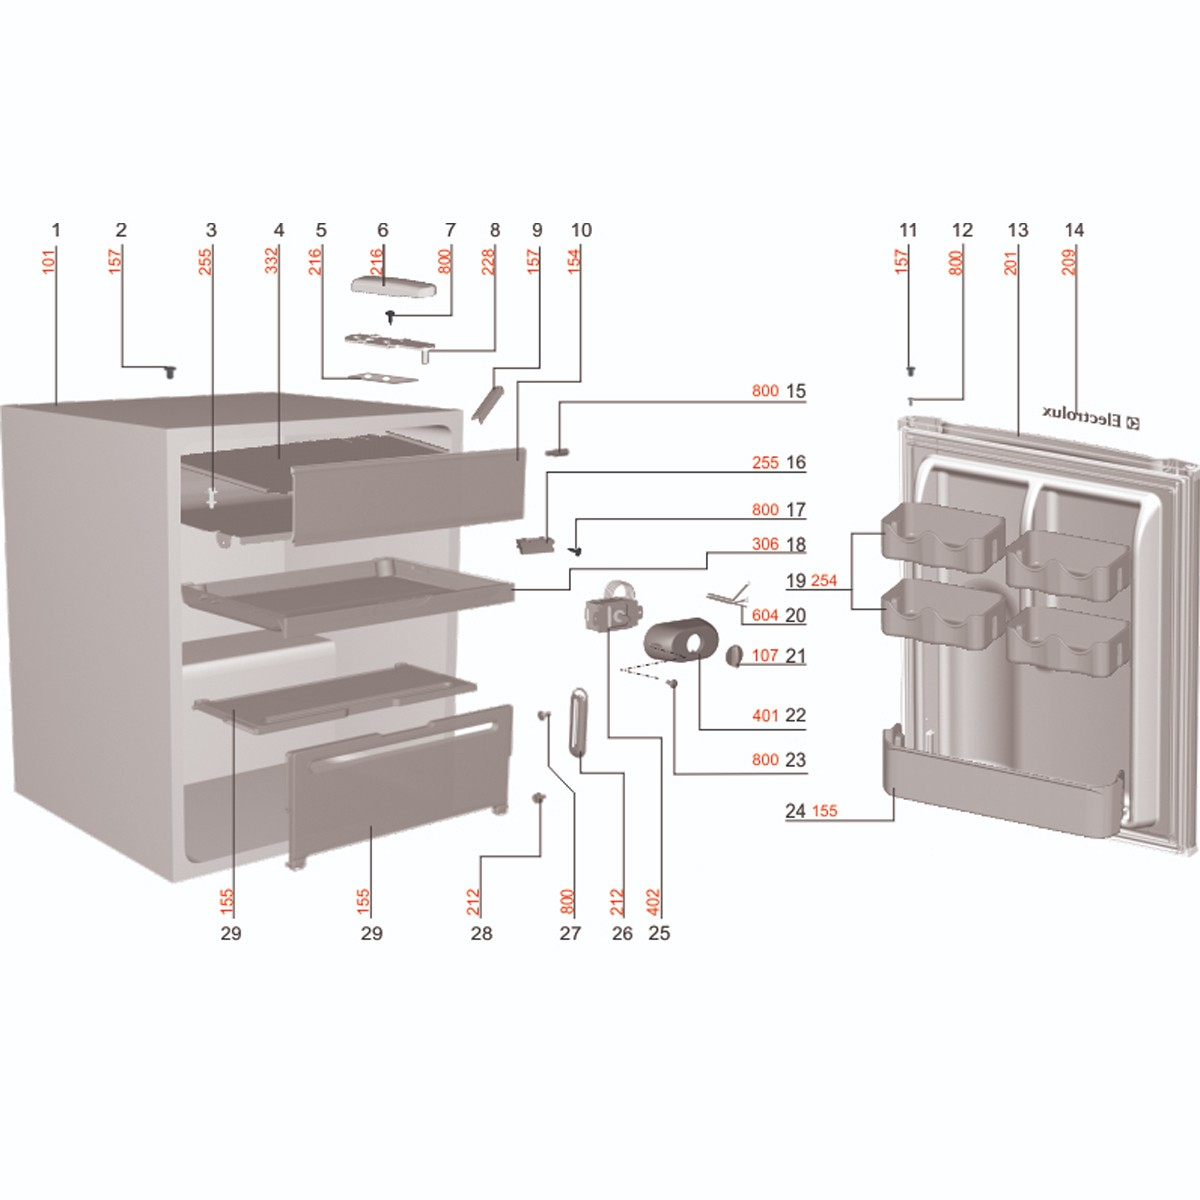 Prateleira Pequena Para Frigobar Electrolux RE80 RE120 - 67492485